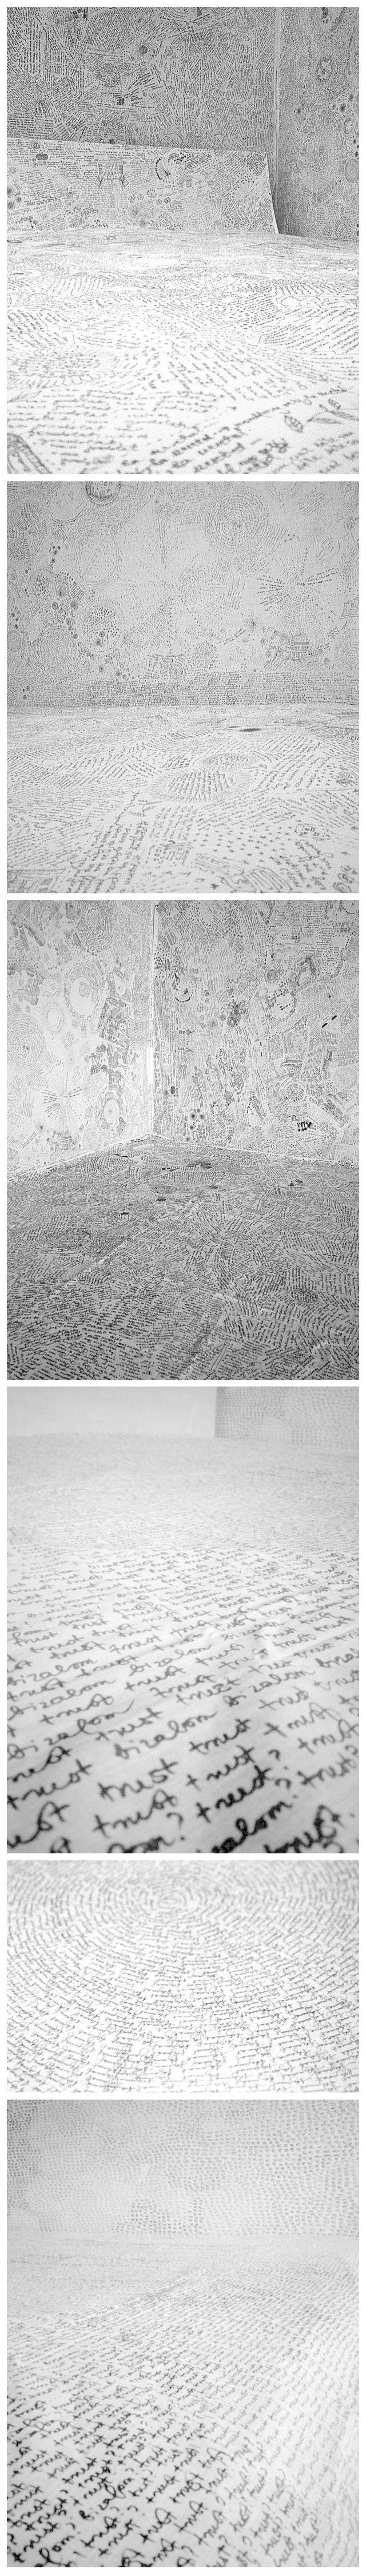 Zsuzsi Csiszer - Sheet Project- drawing, installation, bedsheets